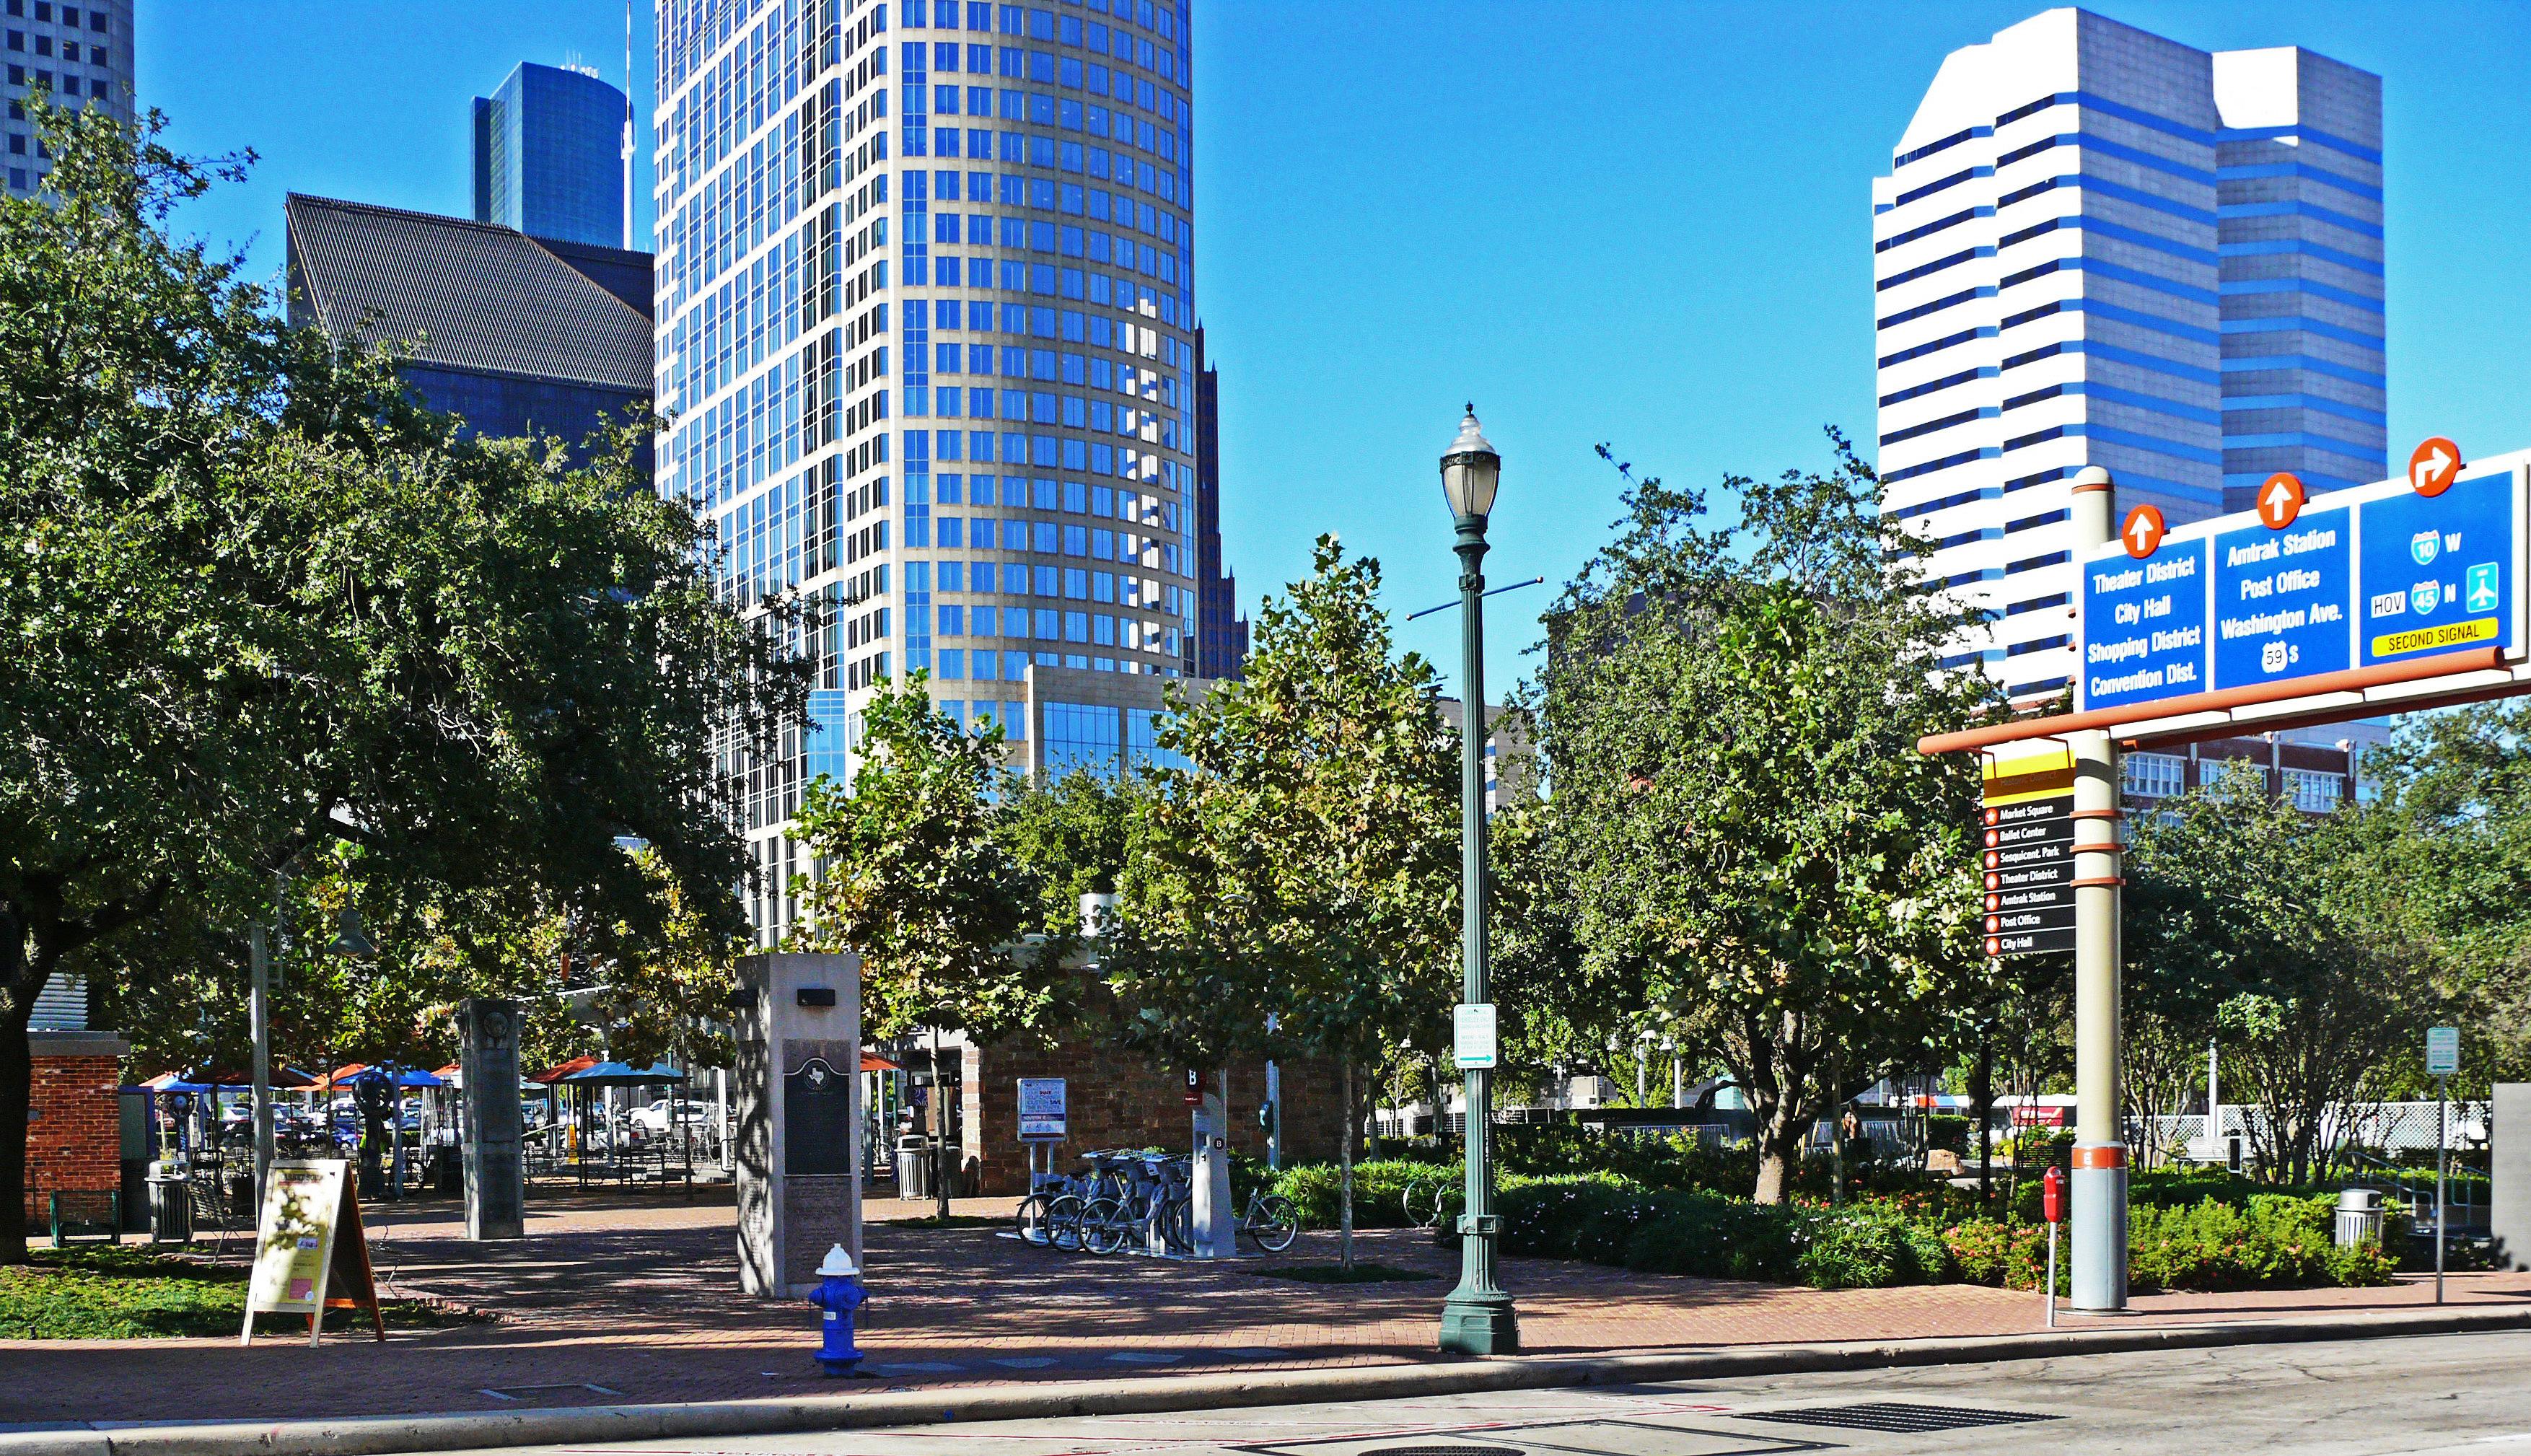 File:Old Market Square, Houston.jpg - Wikimedia Commons